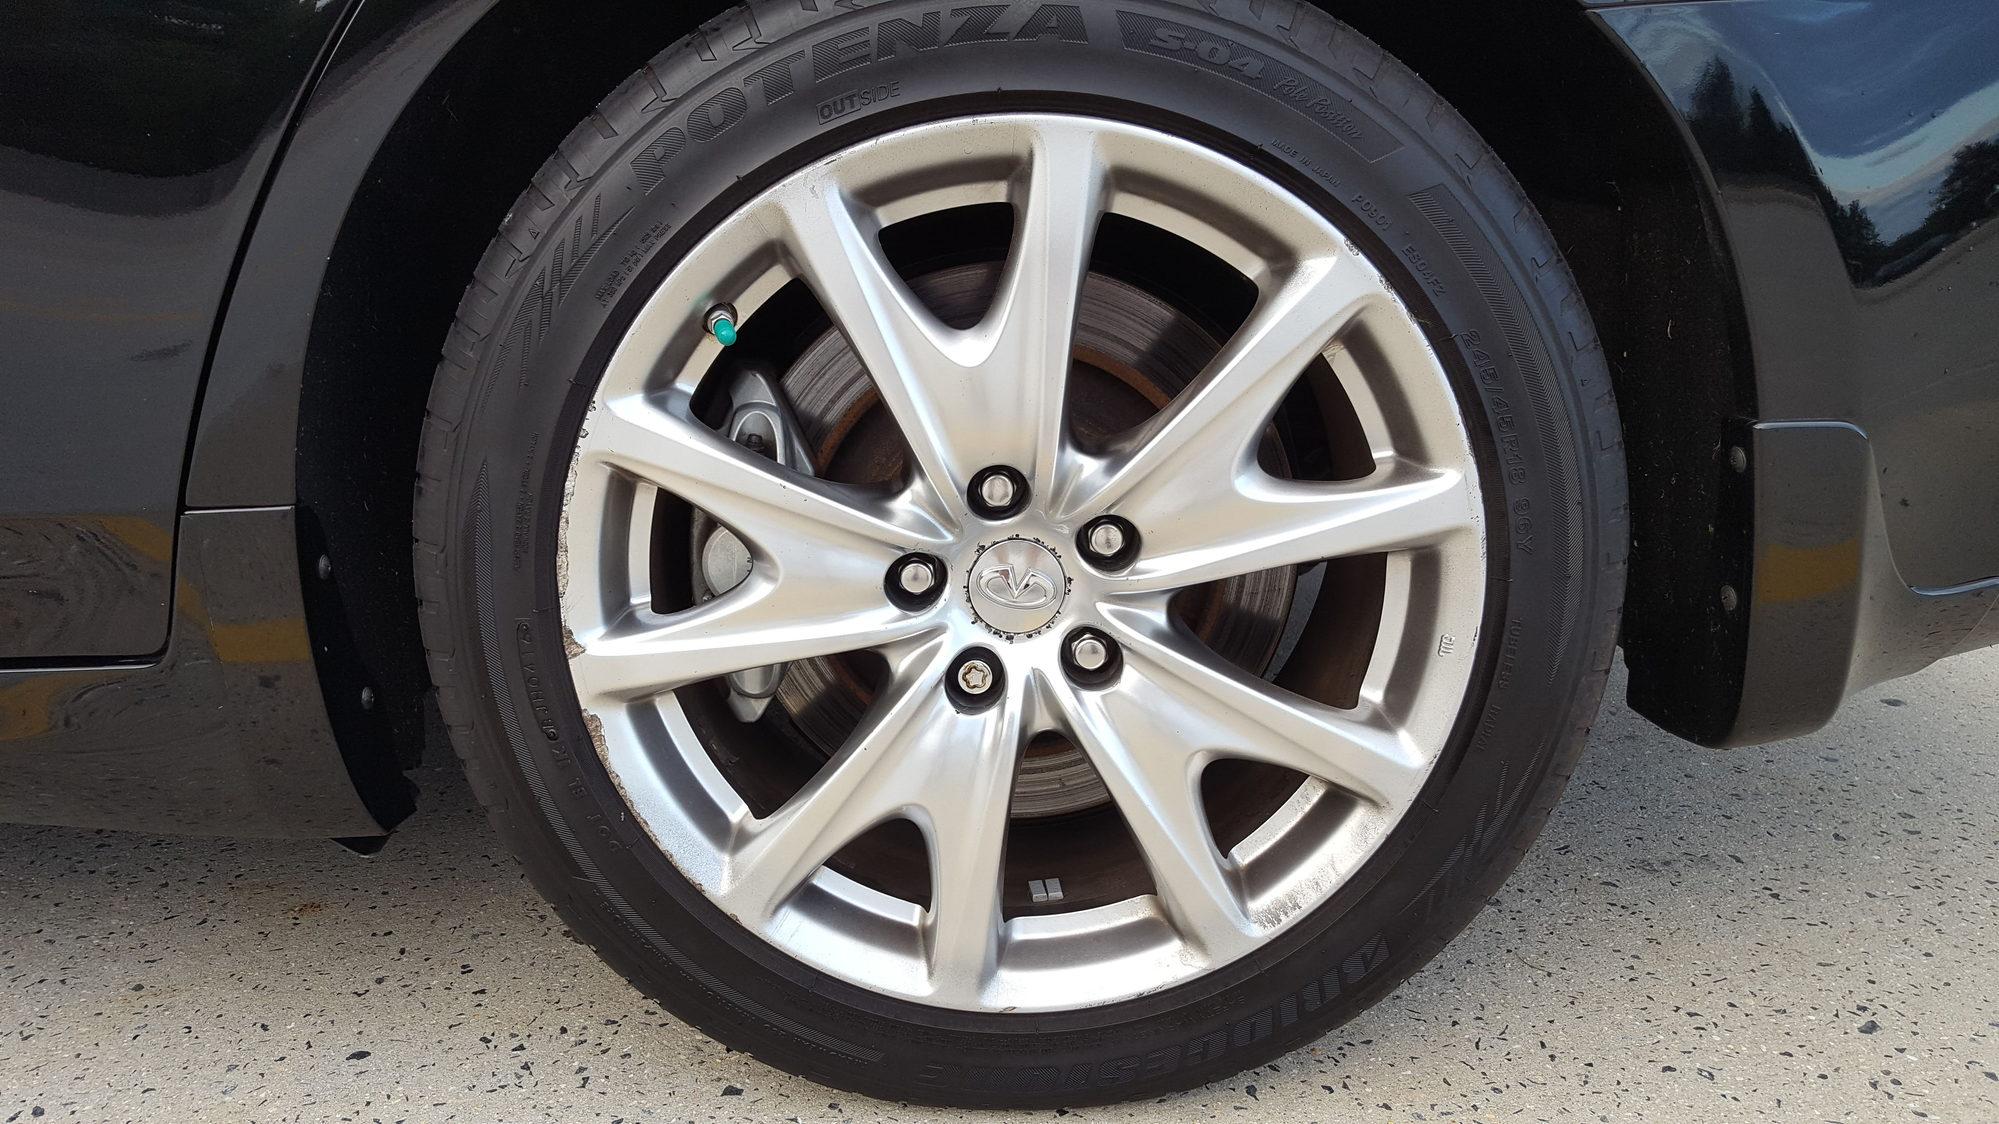 For Sale 2009 Infiniti G37s Sedan 6mt W  Winter Tires